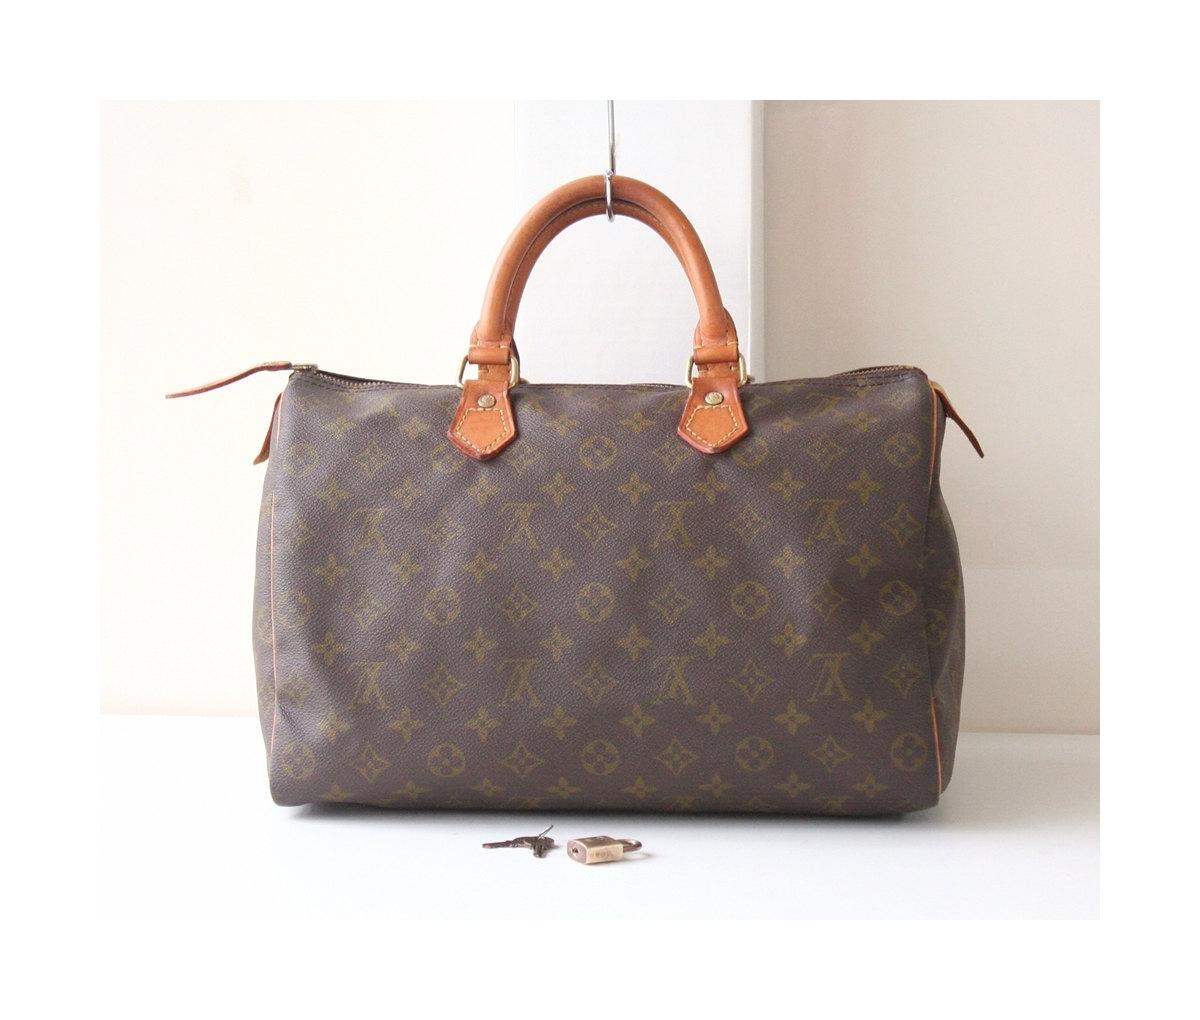 Louis Vuitton clipart designer handbag 35 handbags Speedy monogram bags